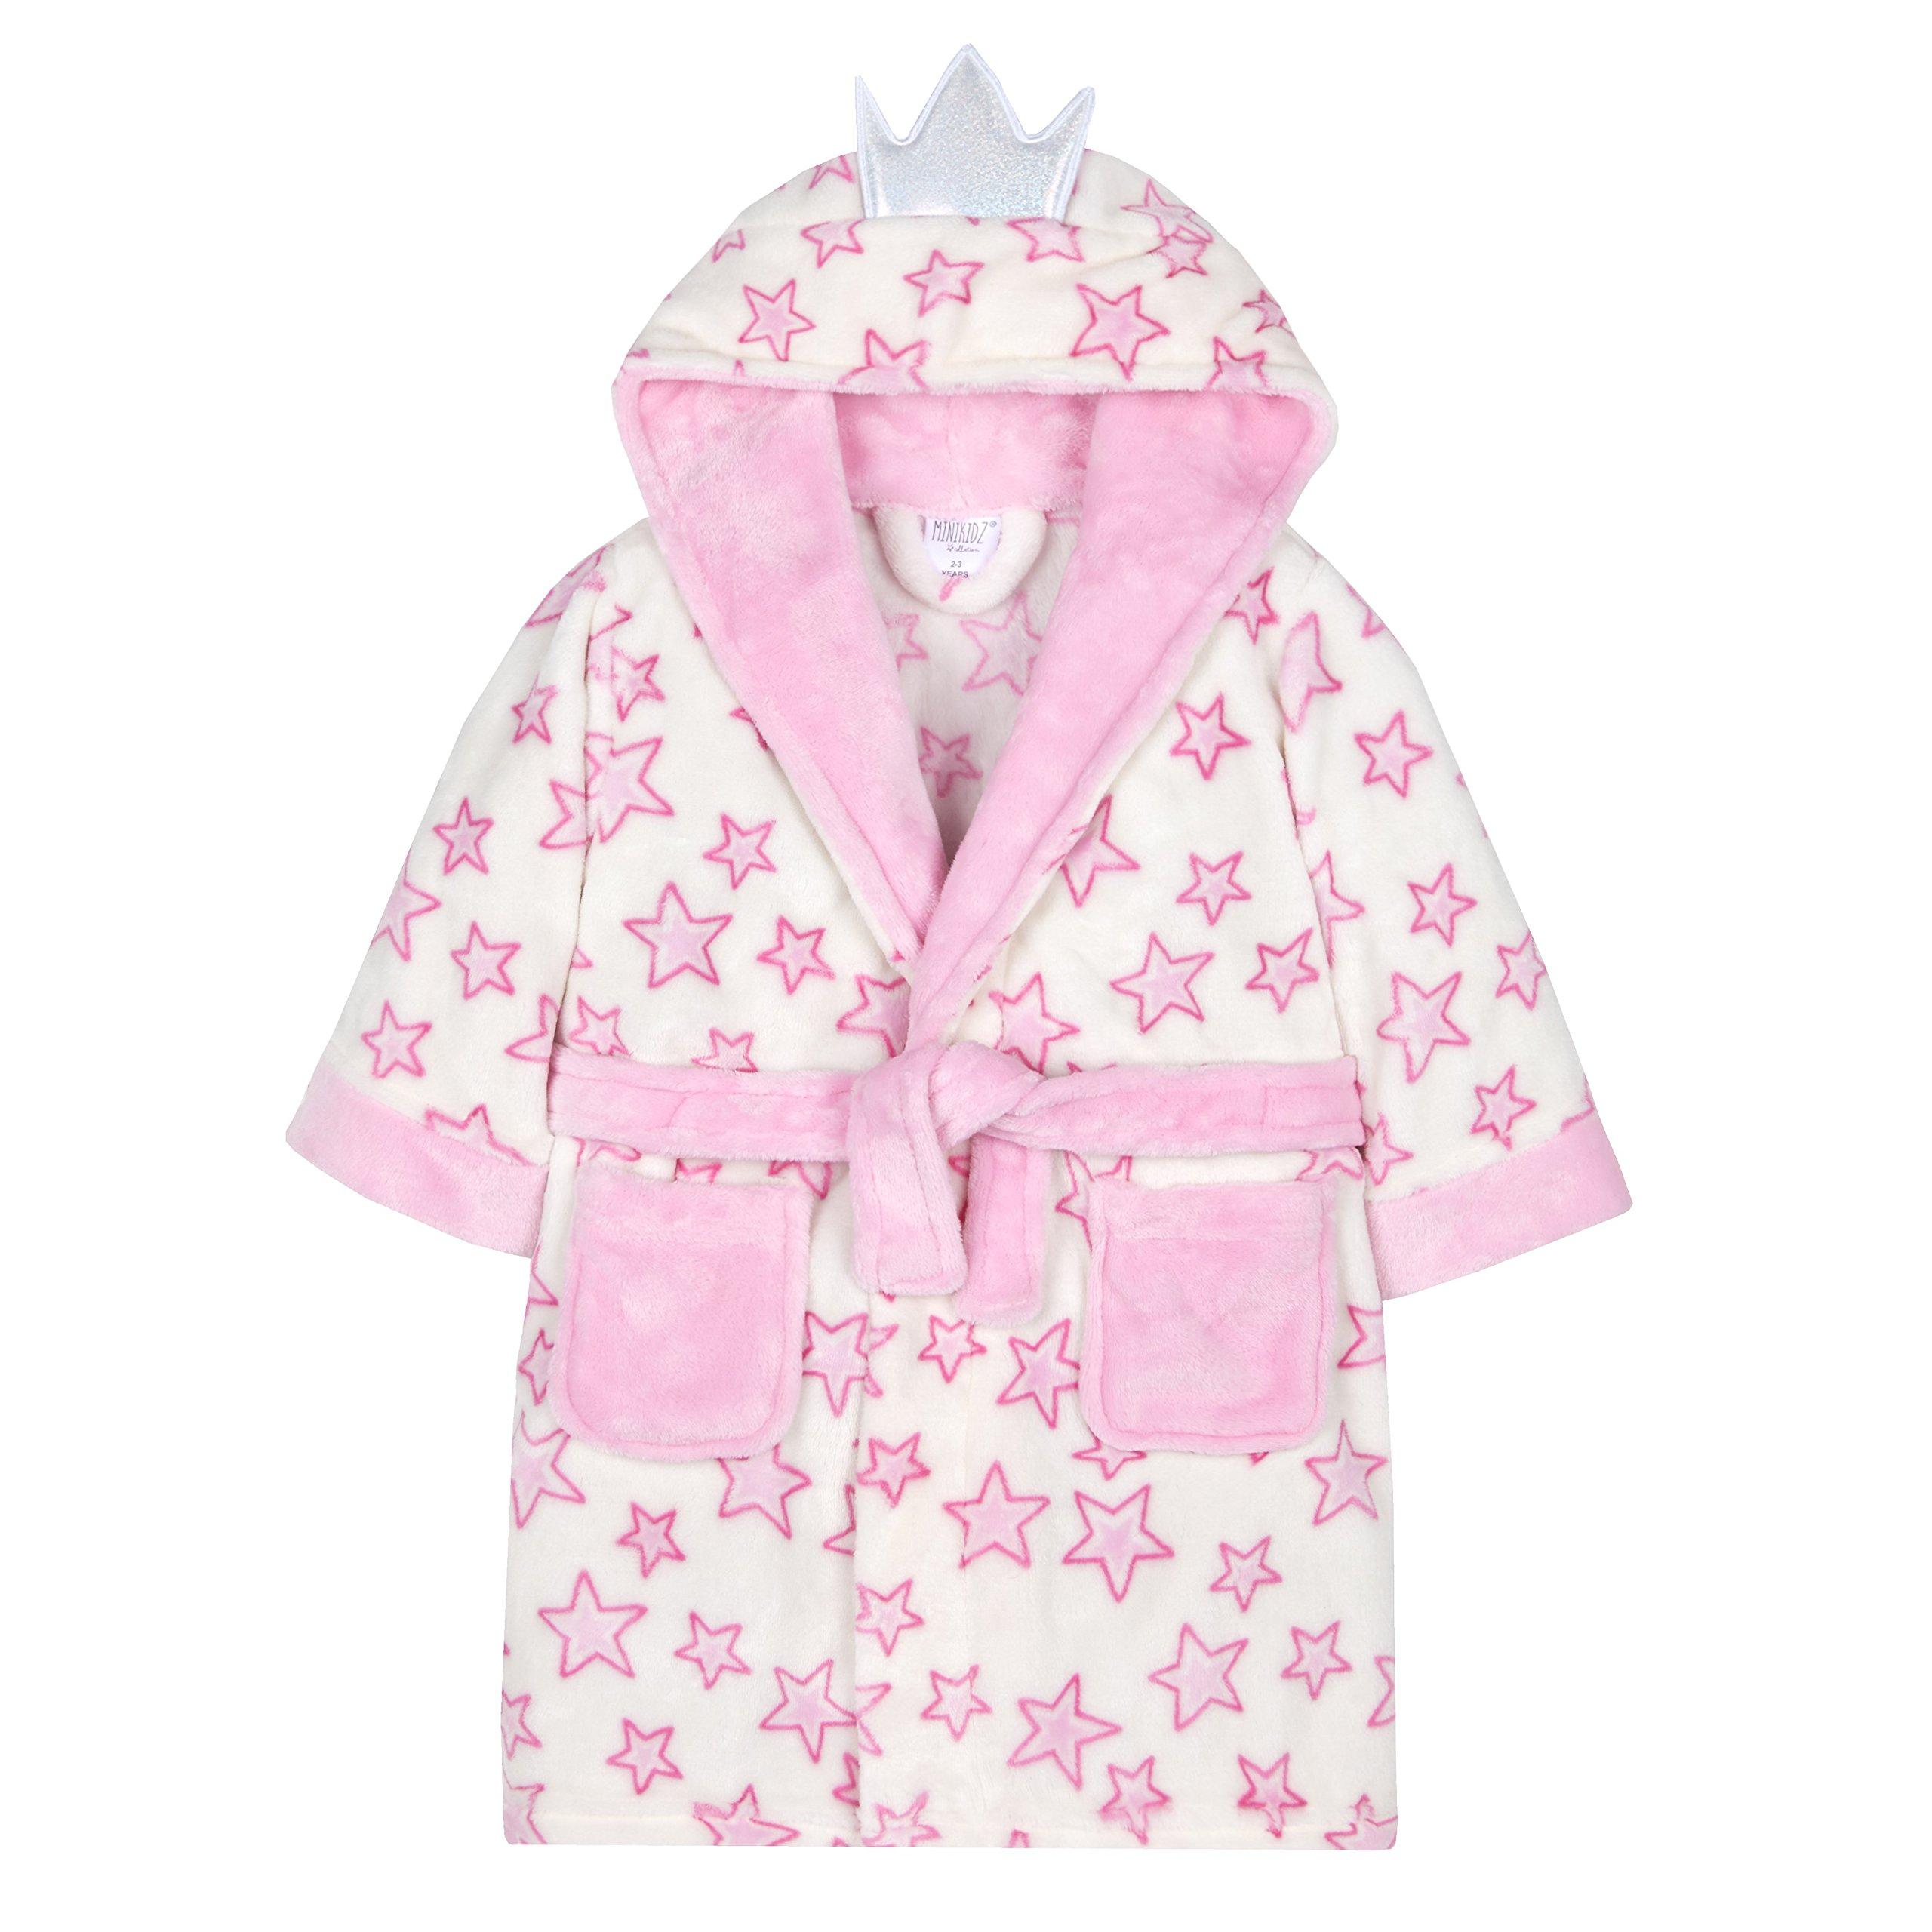 MiniKidz Girls Plush Fleece Fairy Princess Dressing Gown Cream 2-3 Years